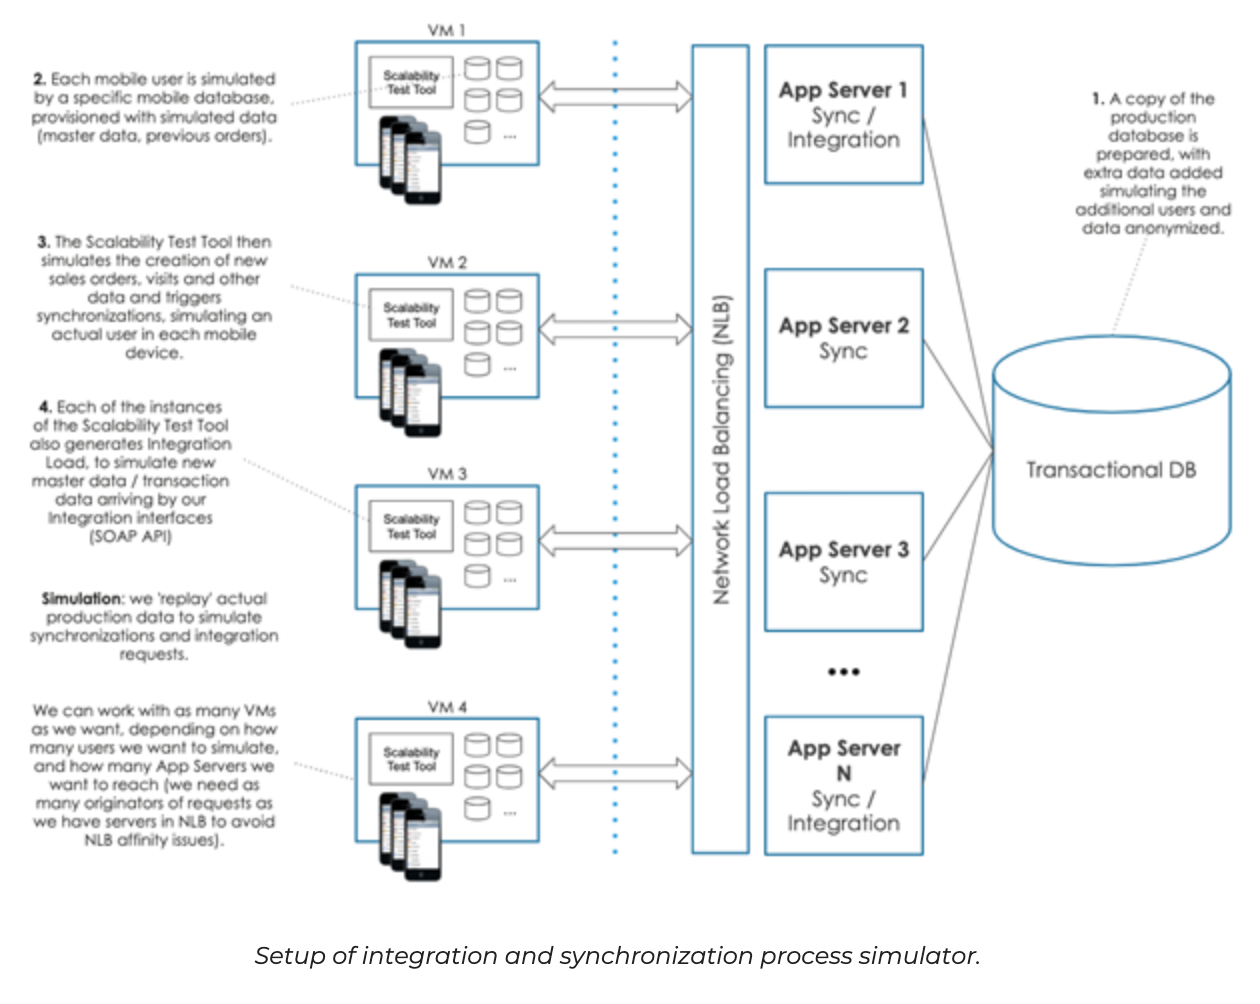 SAP integration and synchronization